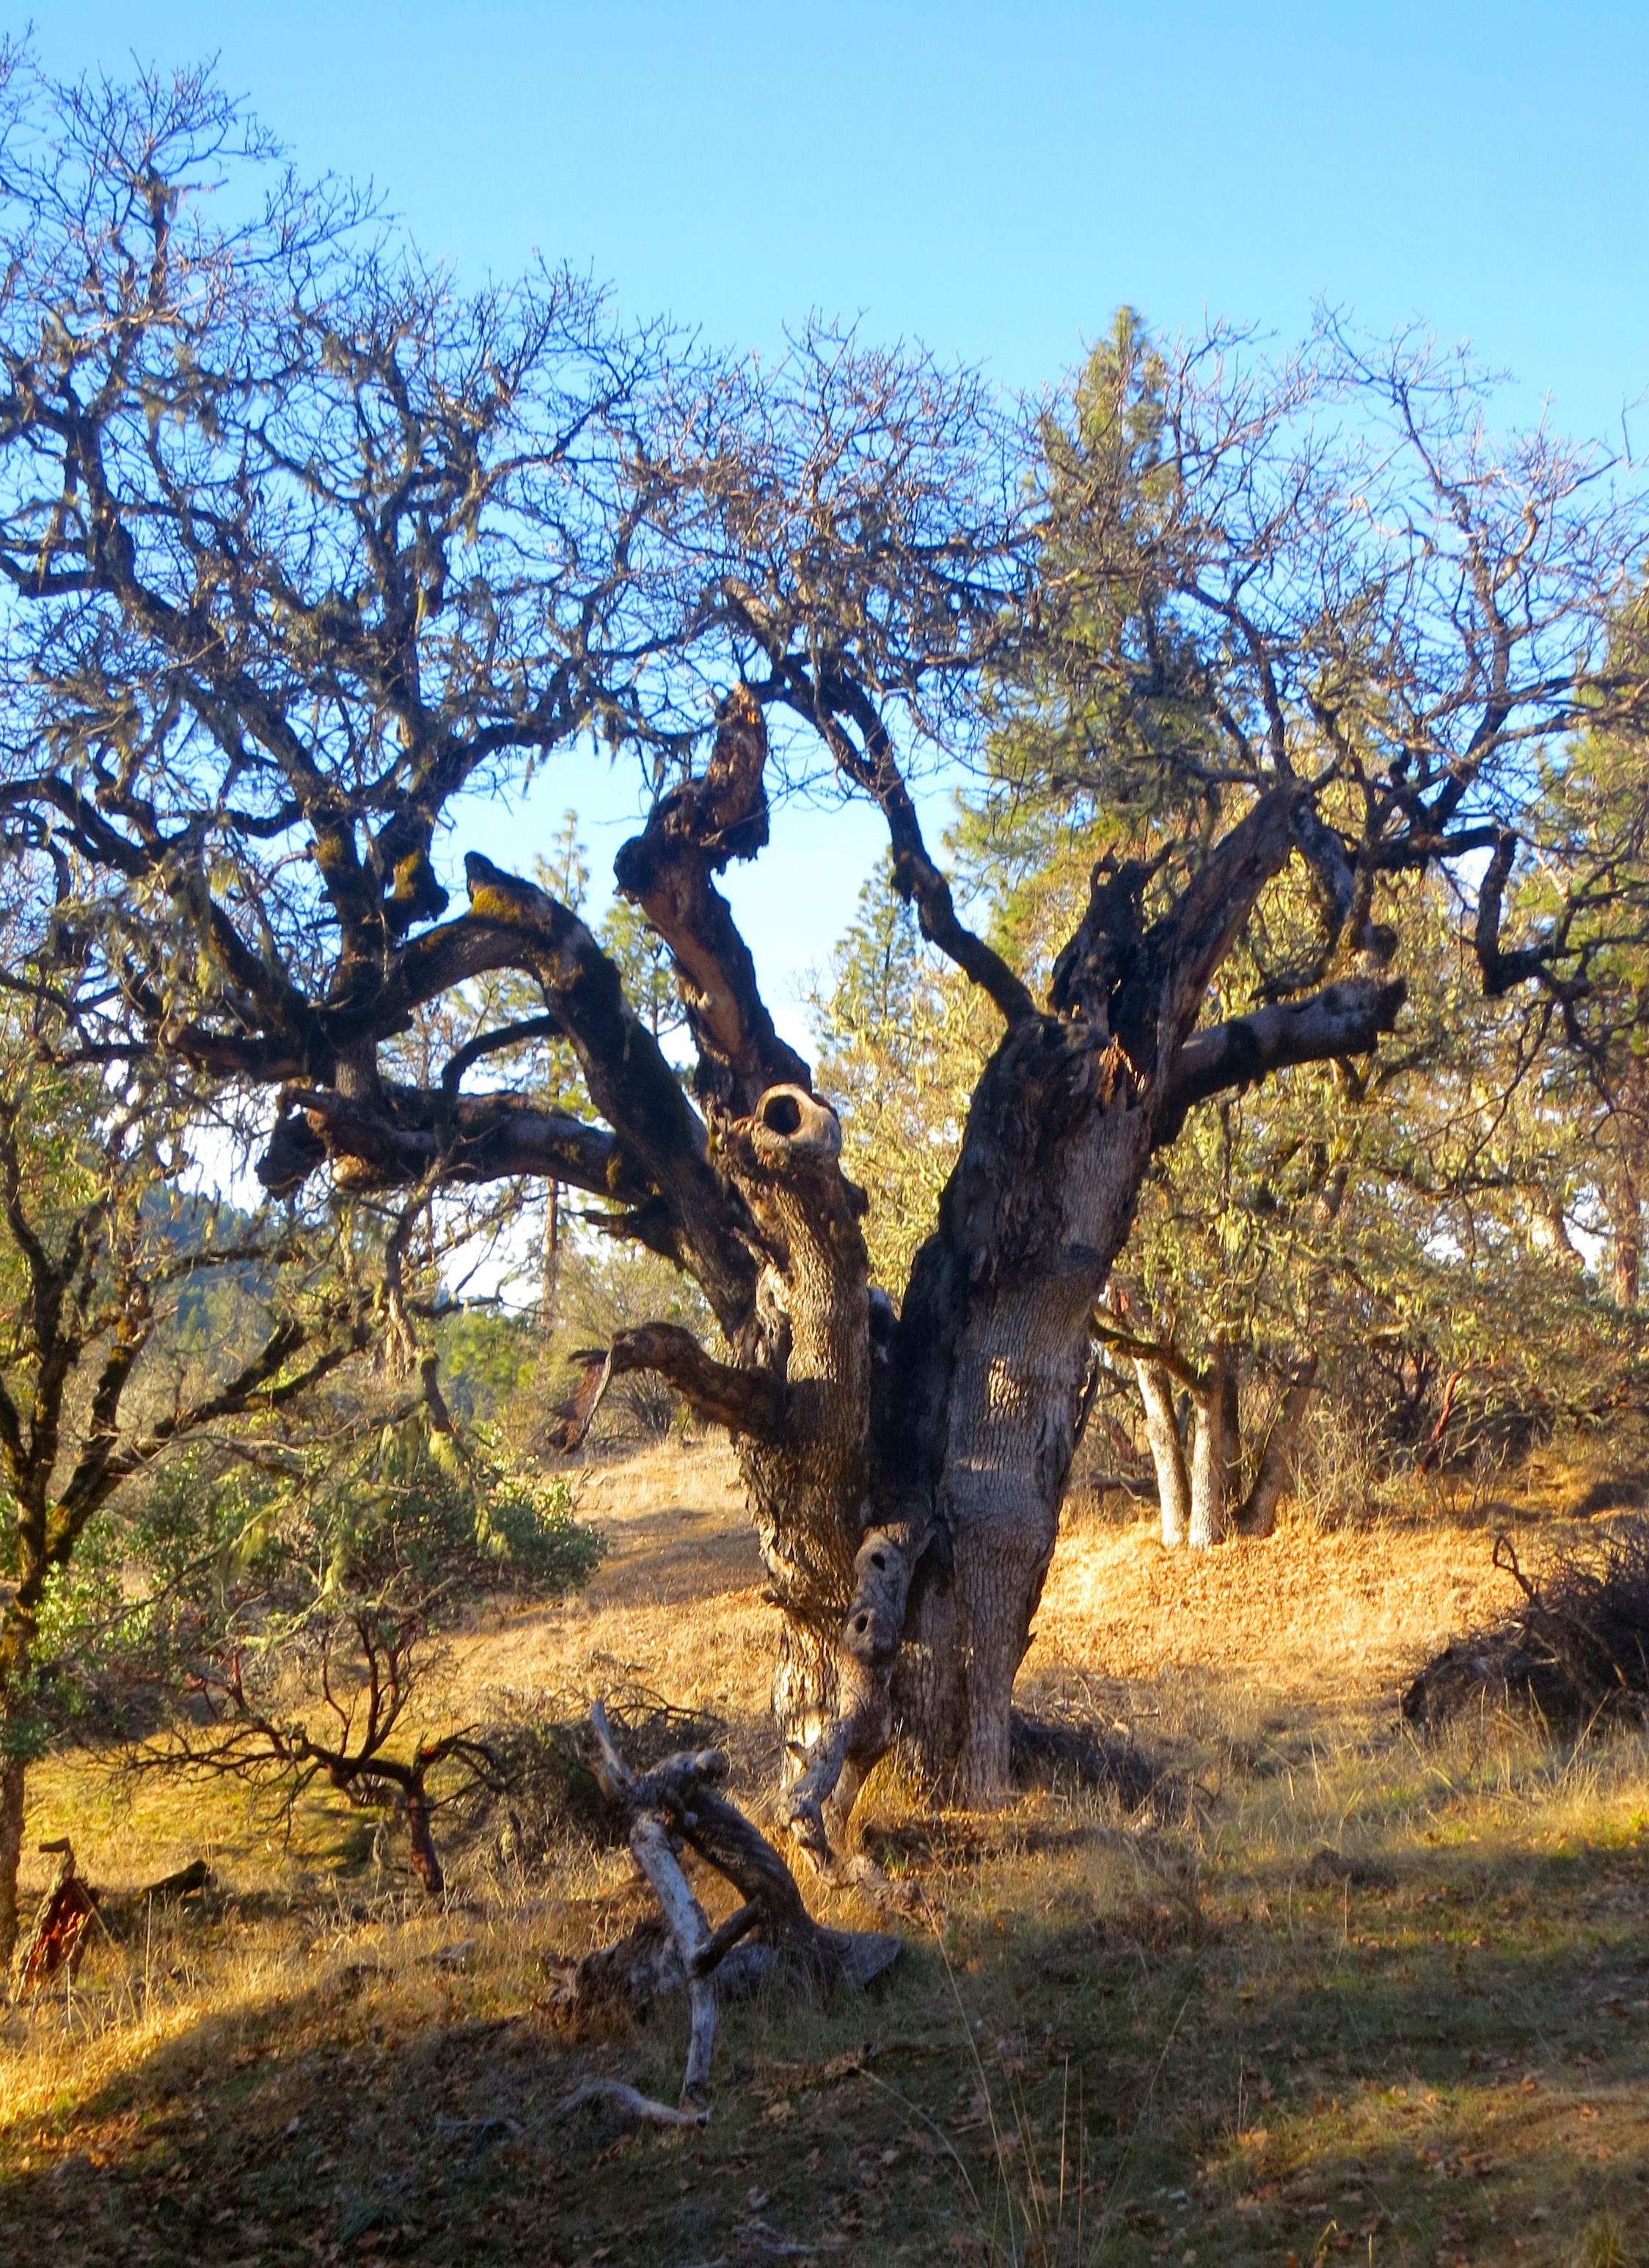 Hobbit Tree in Applegate Valley, Oregon. Photo by Curtis Mekemson.